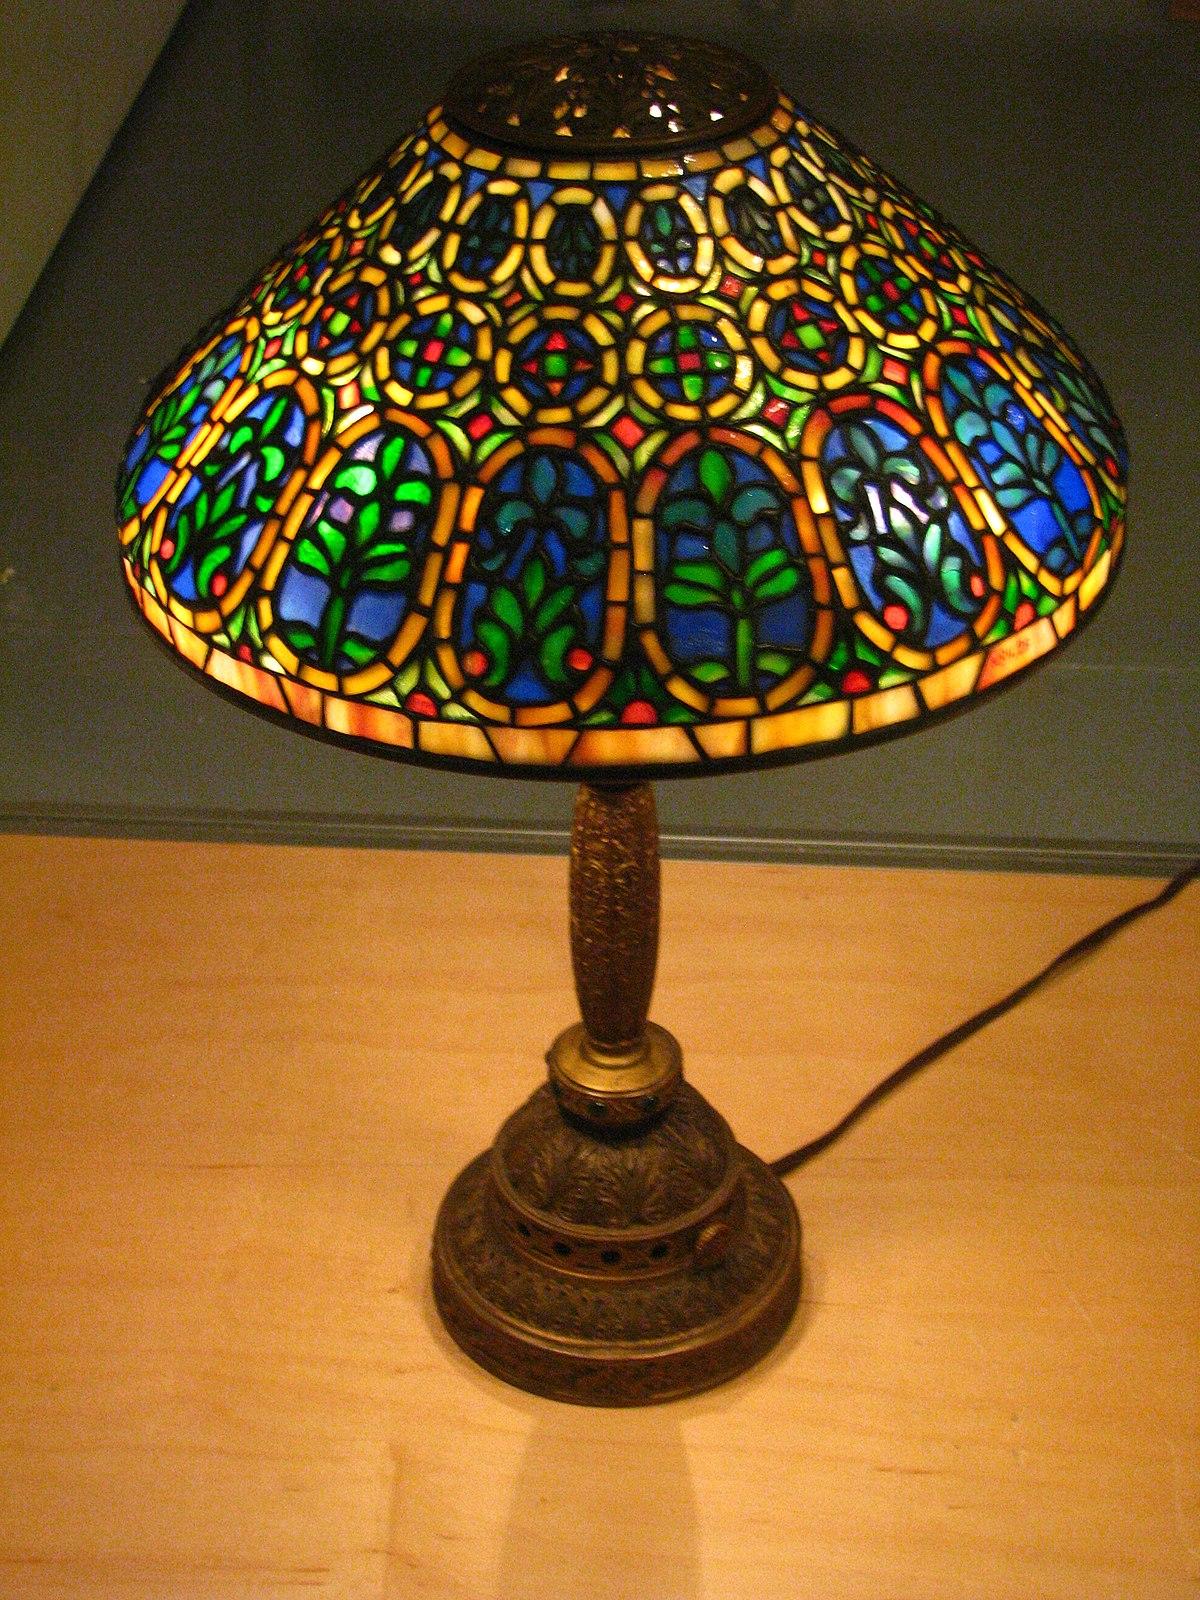 Tiffany lamp  Simple English Wikipedia the free encyclopedia